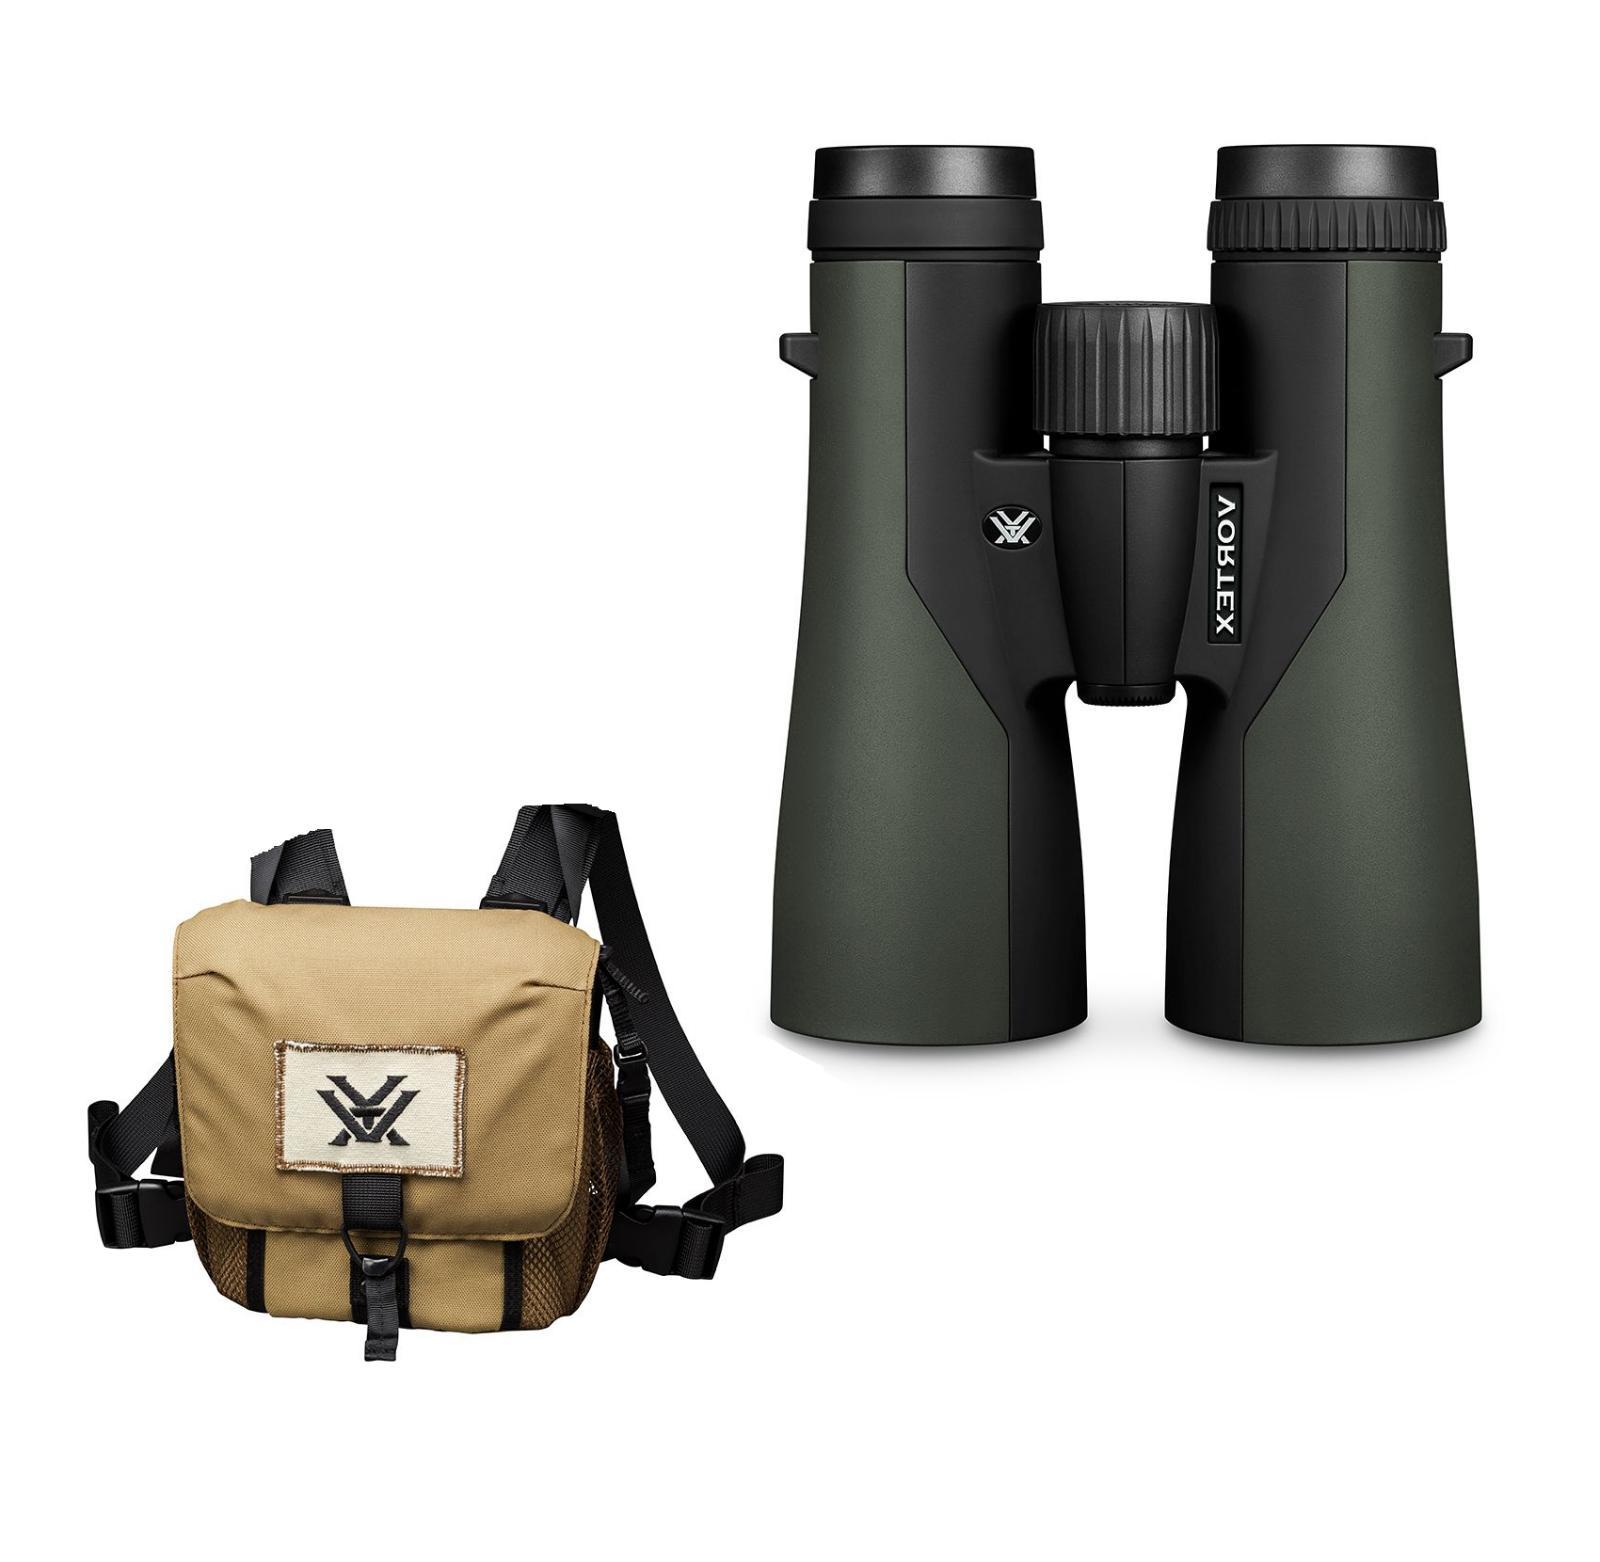 10x42 crossfire hd binoculars cf 4312